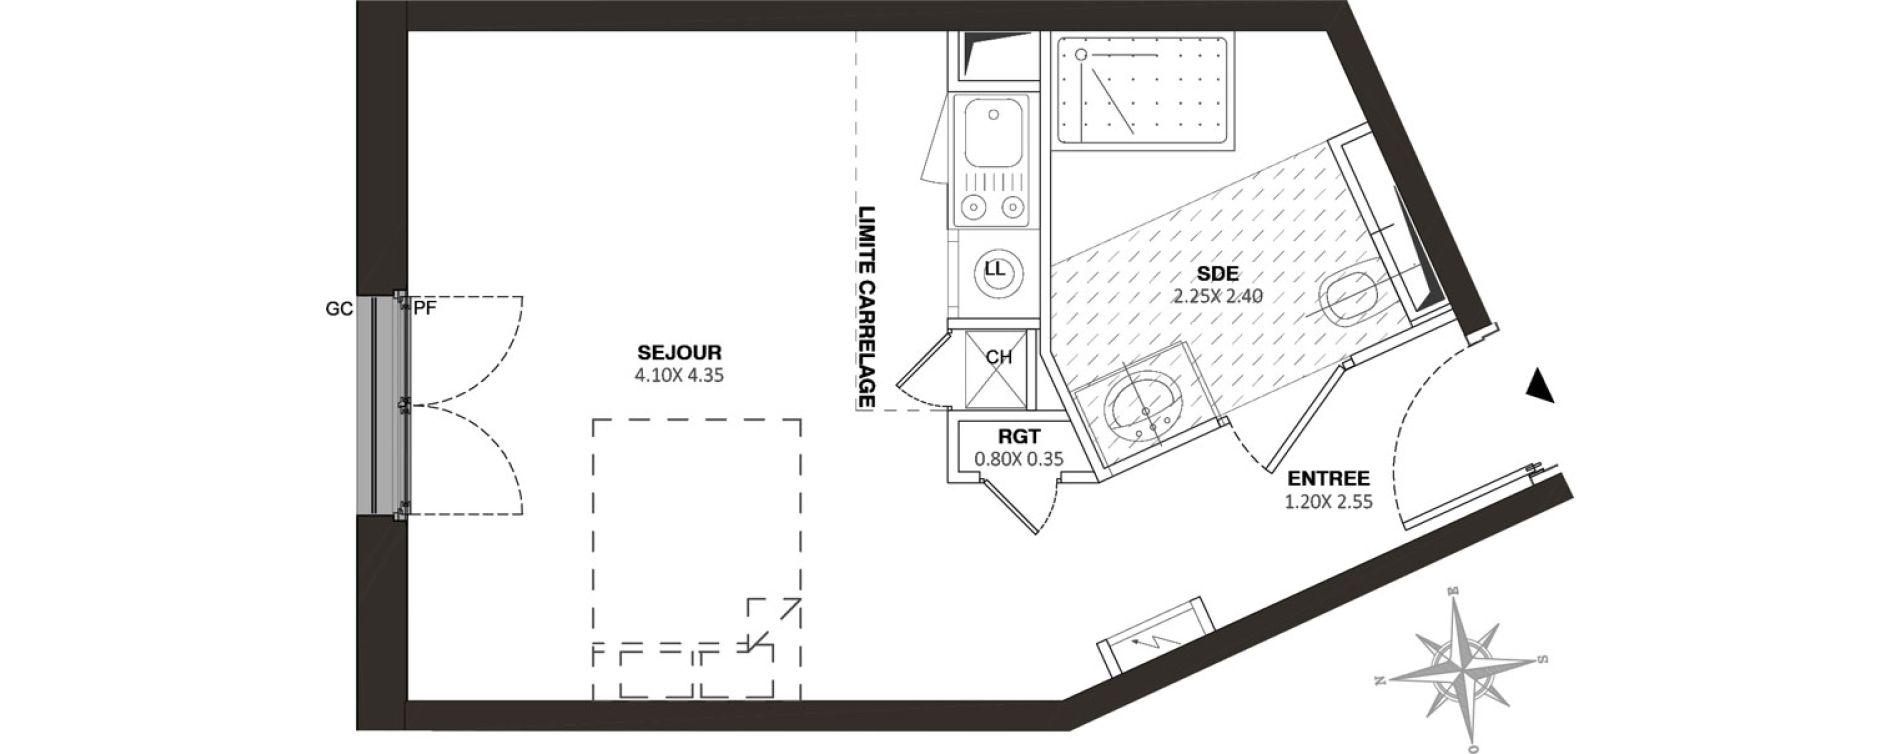 Appartement T1 de 26,80 m2 à Viroflay Rive droite viroflay